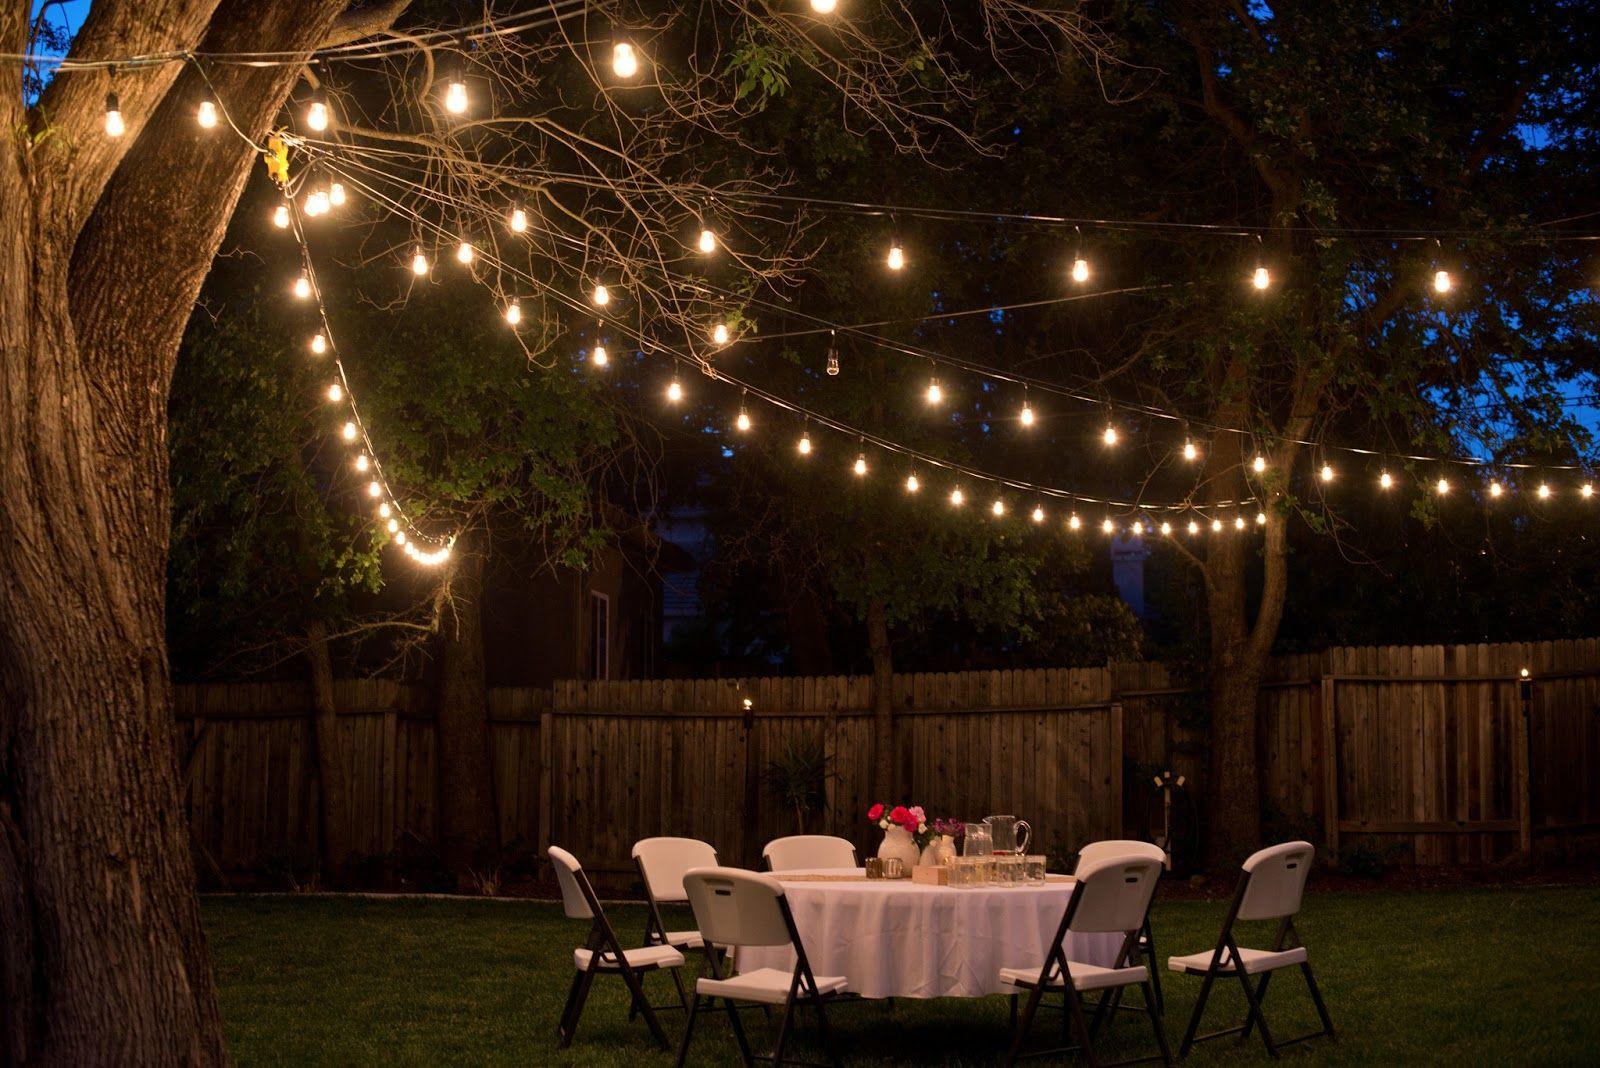 Backyard Party Ideas Lighting  backyard lights Google Search City Scenes